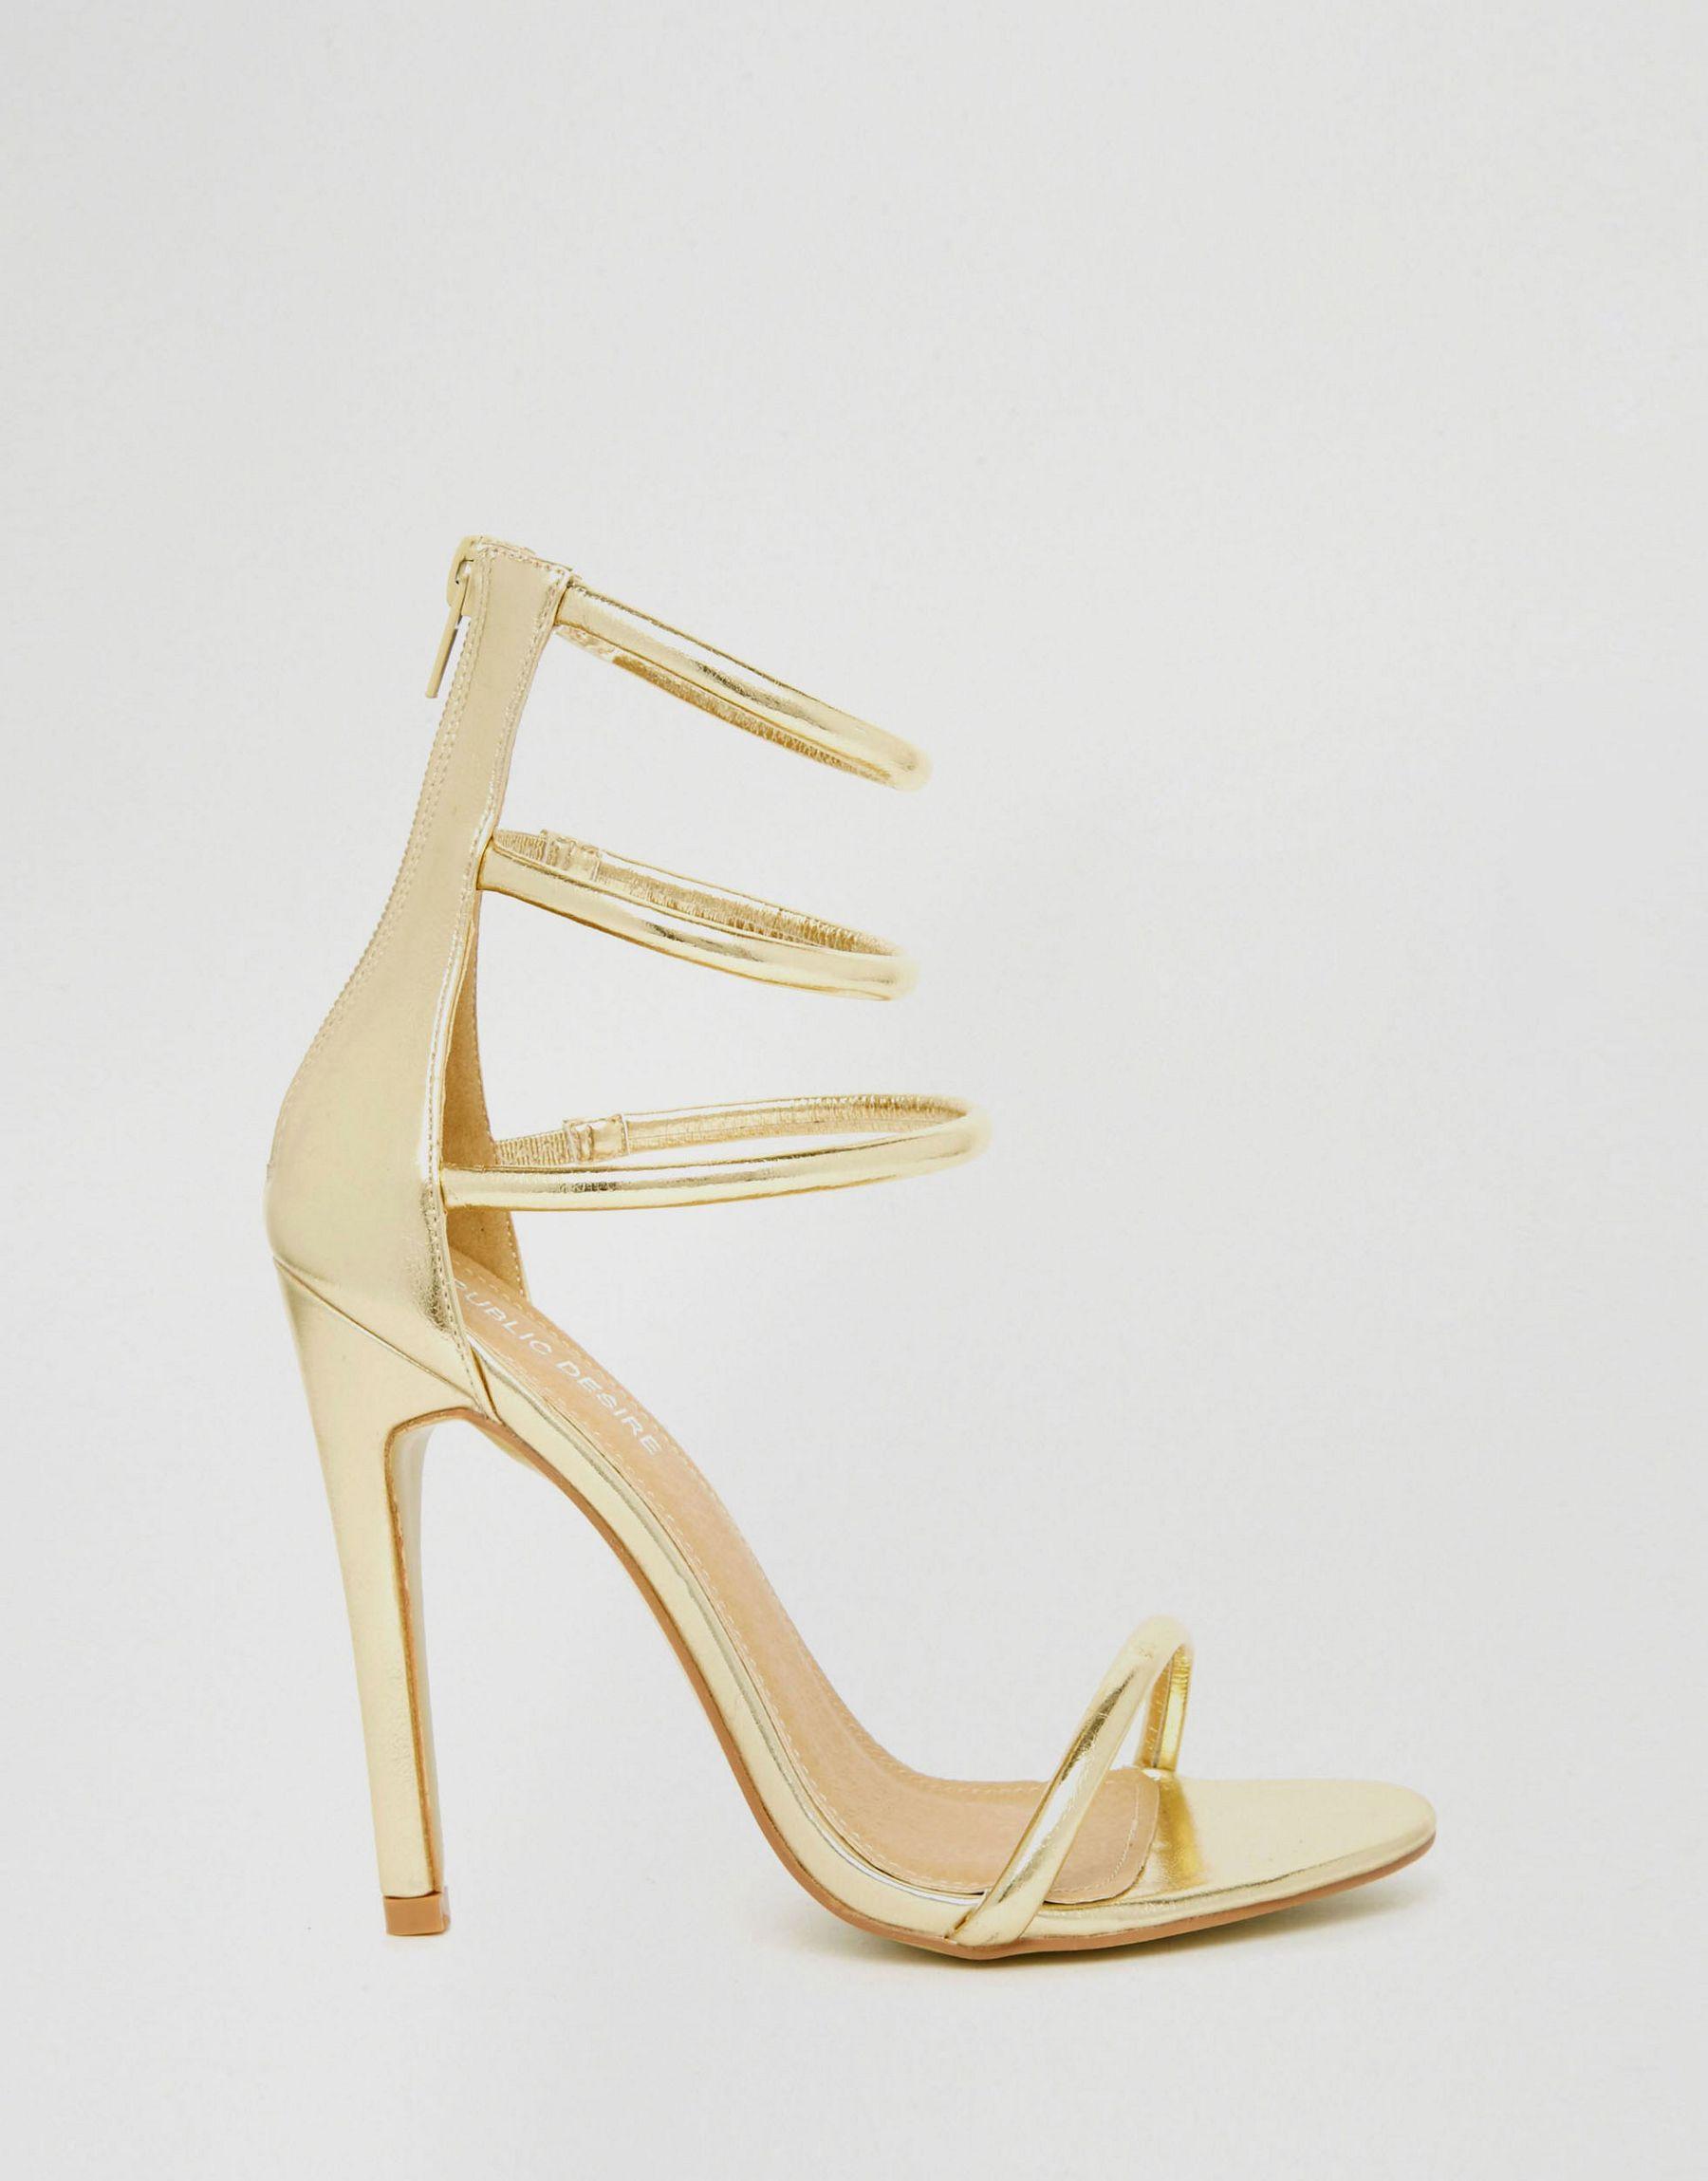 247935bf17a2ba Lyst - Public Desire Aisha Gold Strappy Heeled Sandal in Metallic